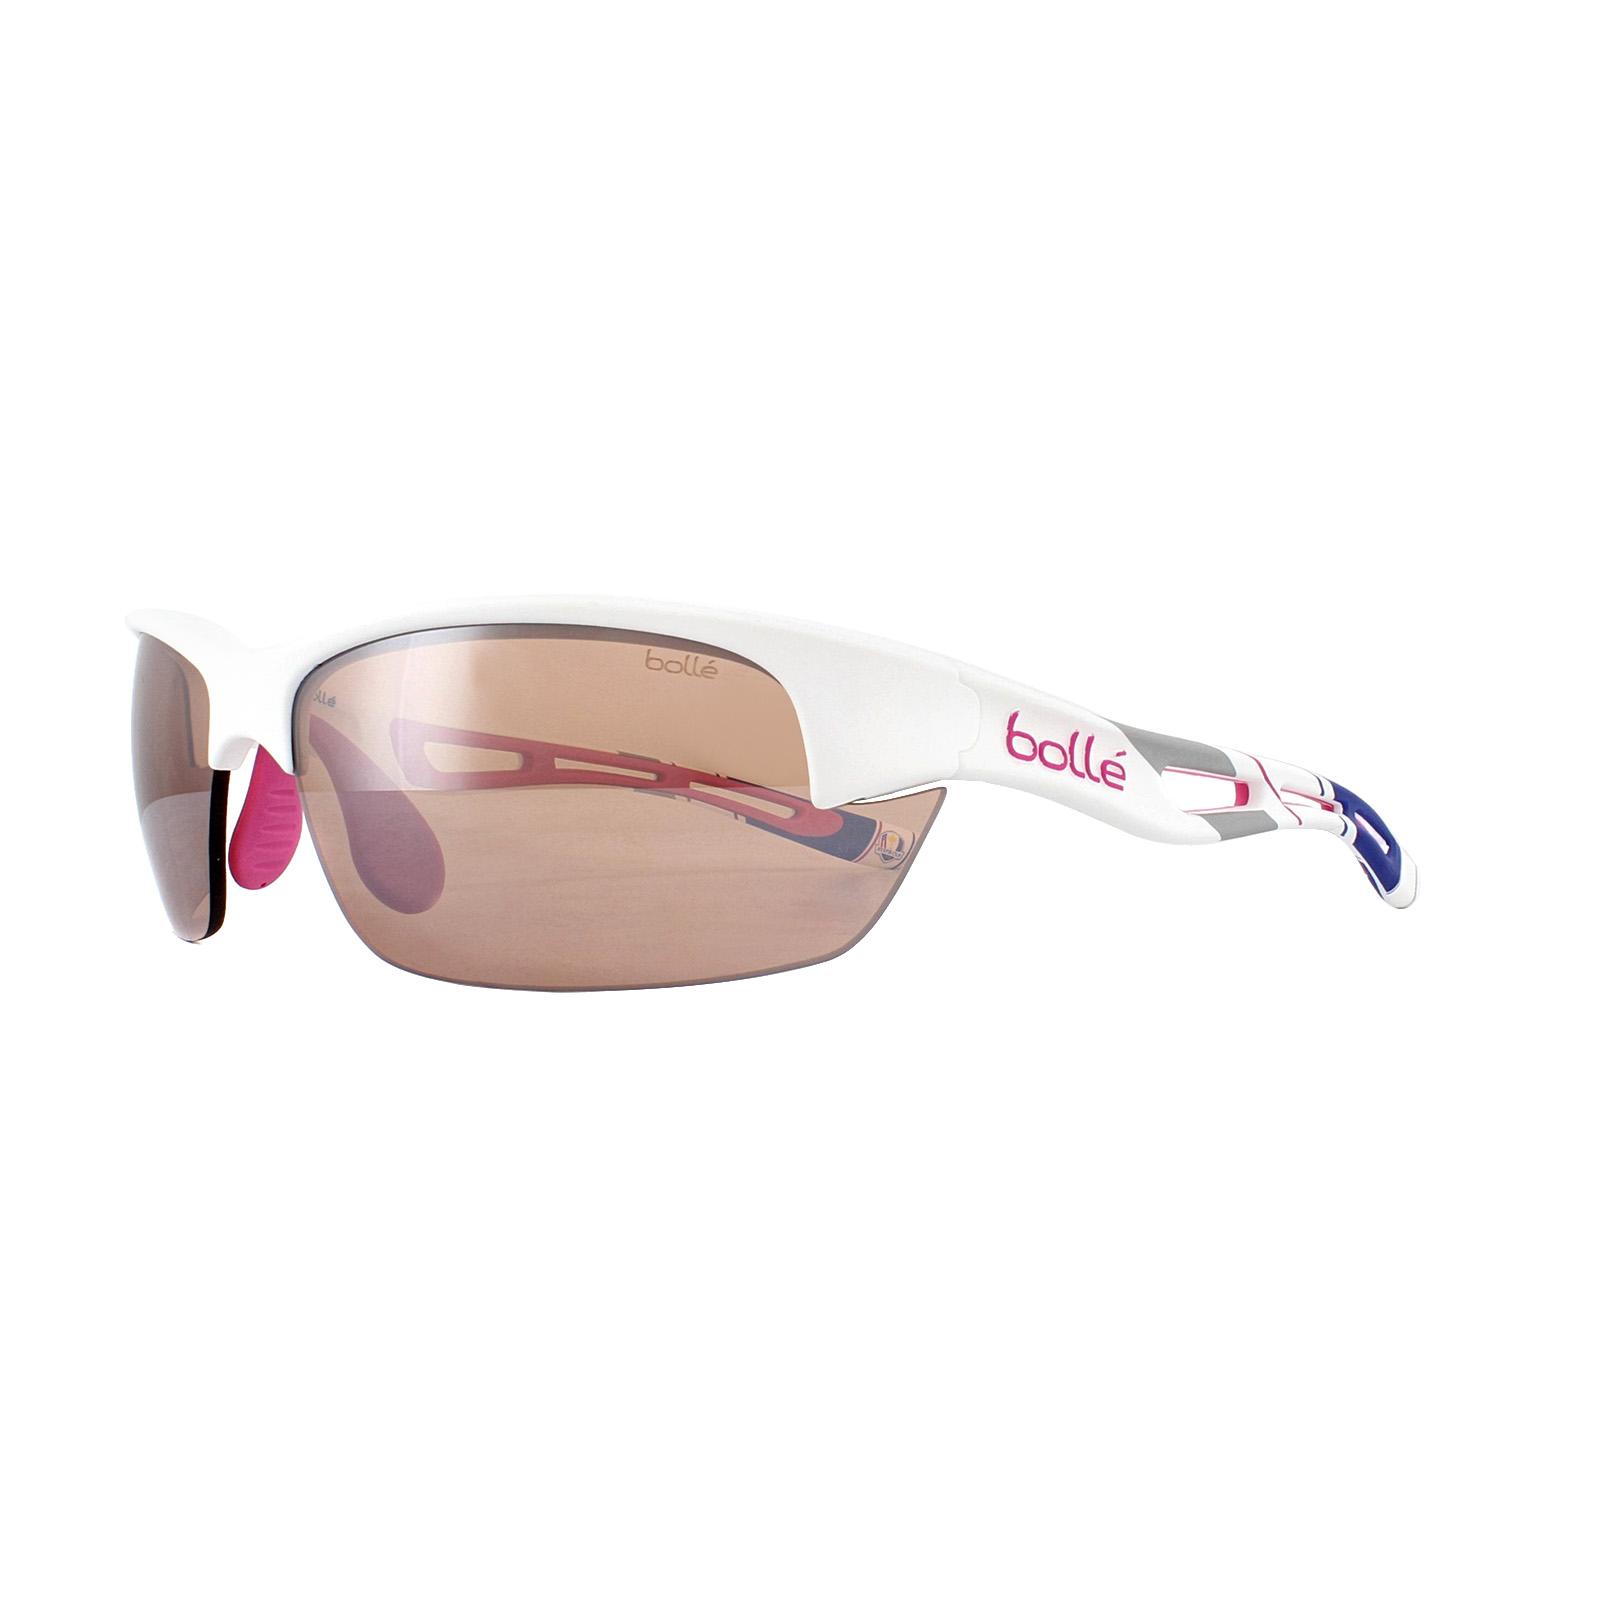 5c8d7685ae Sentinel Bolle Sunglasses Bolt S 12171 Ryder Cup Shiny White Modulator V3  Golf